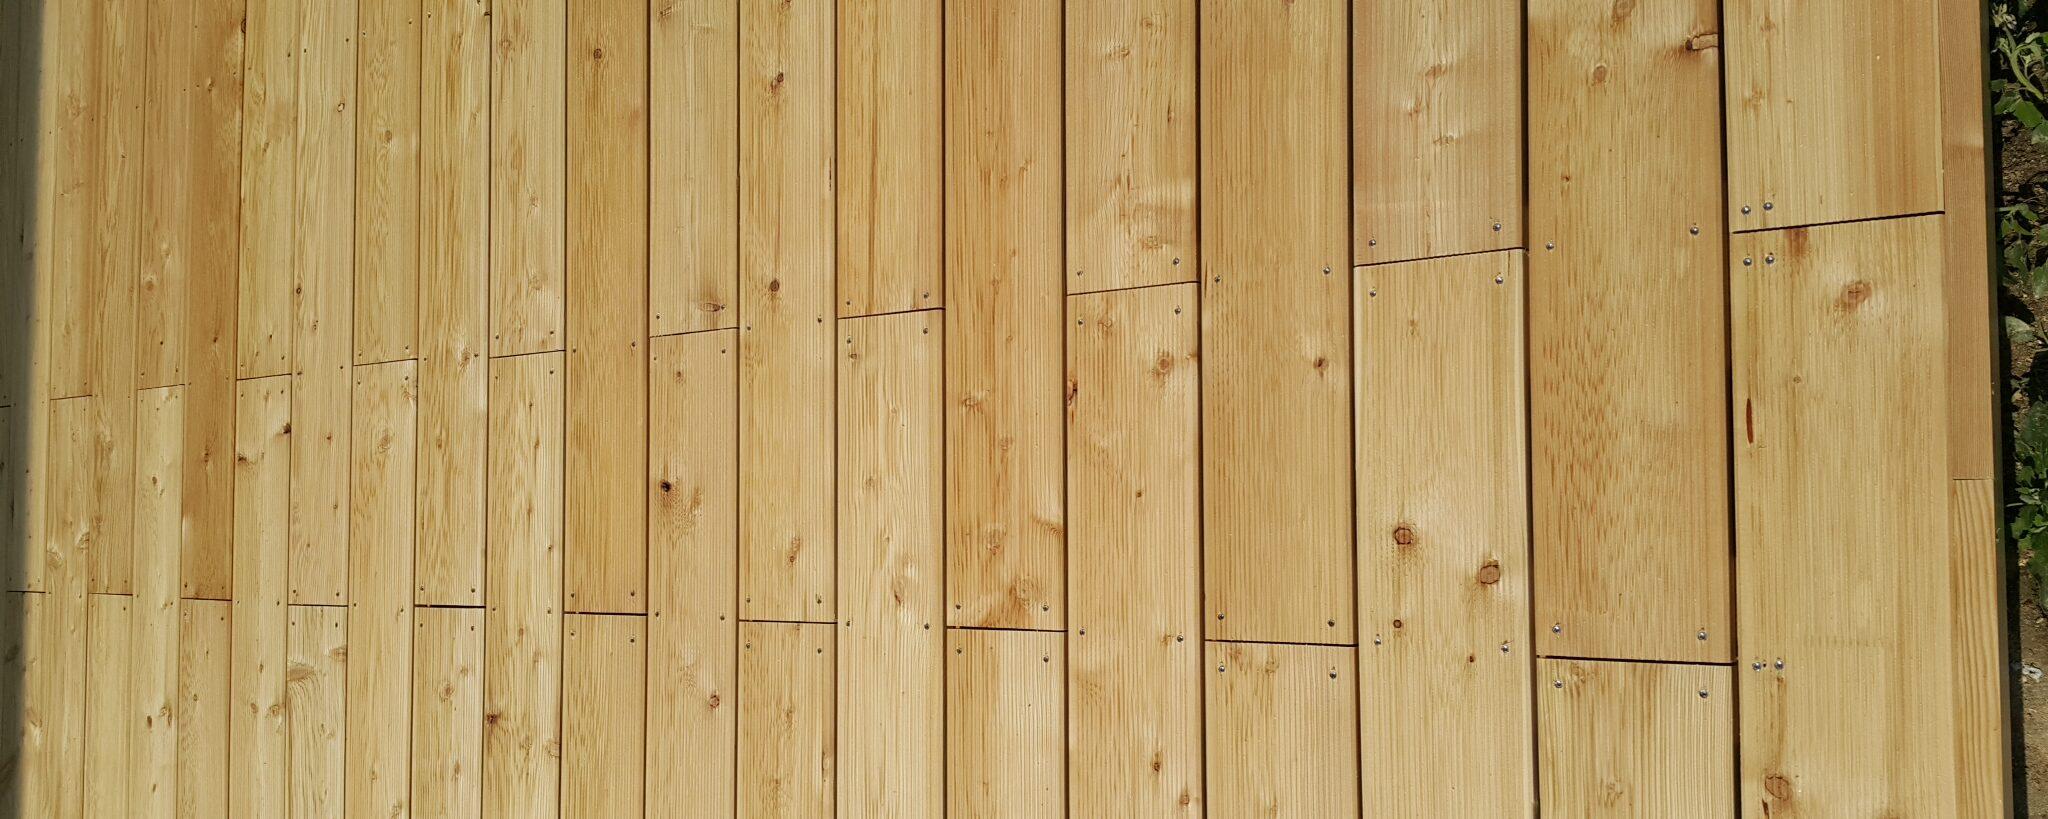 Lesena terasa iz sibirskega macesna vidno vijačena